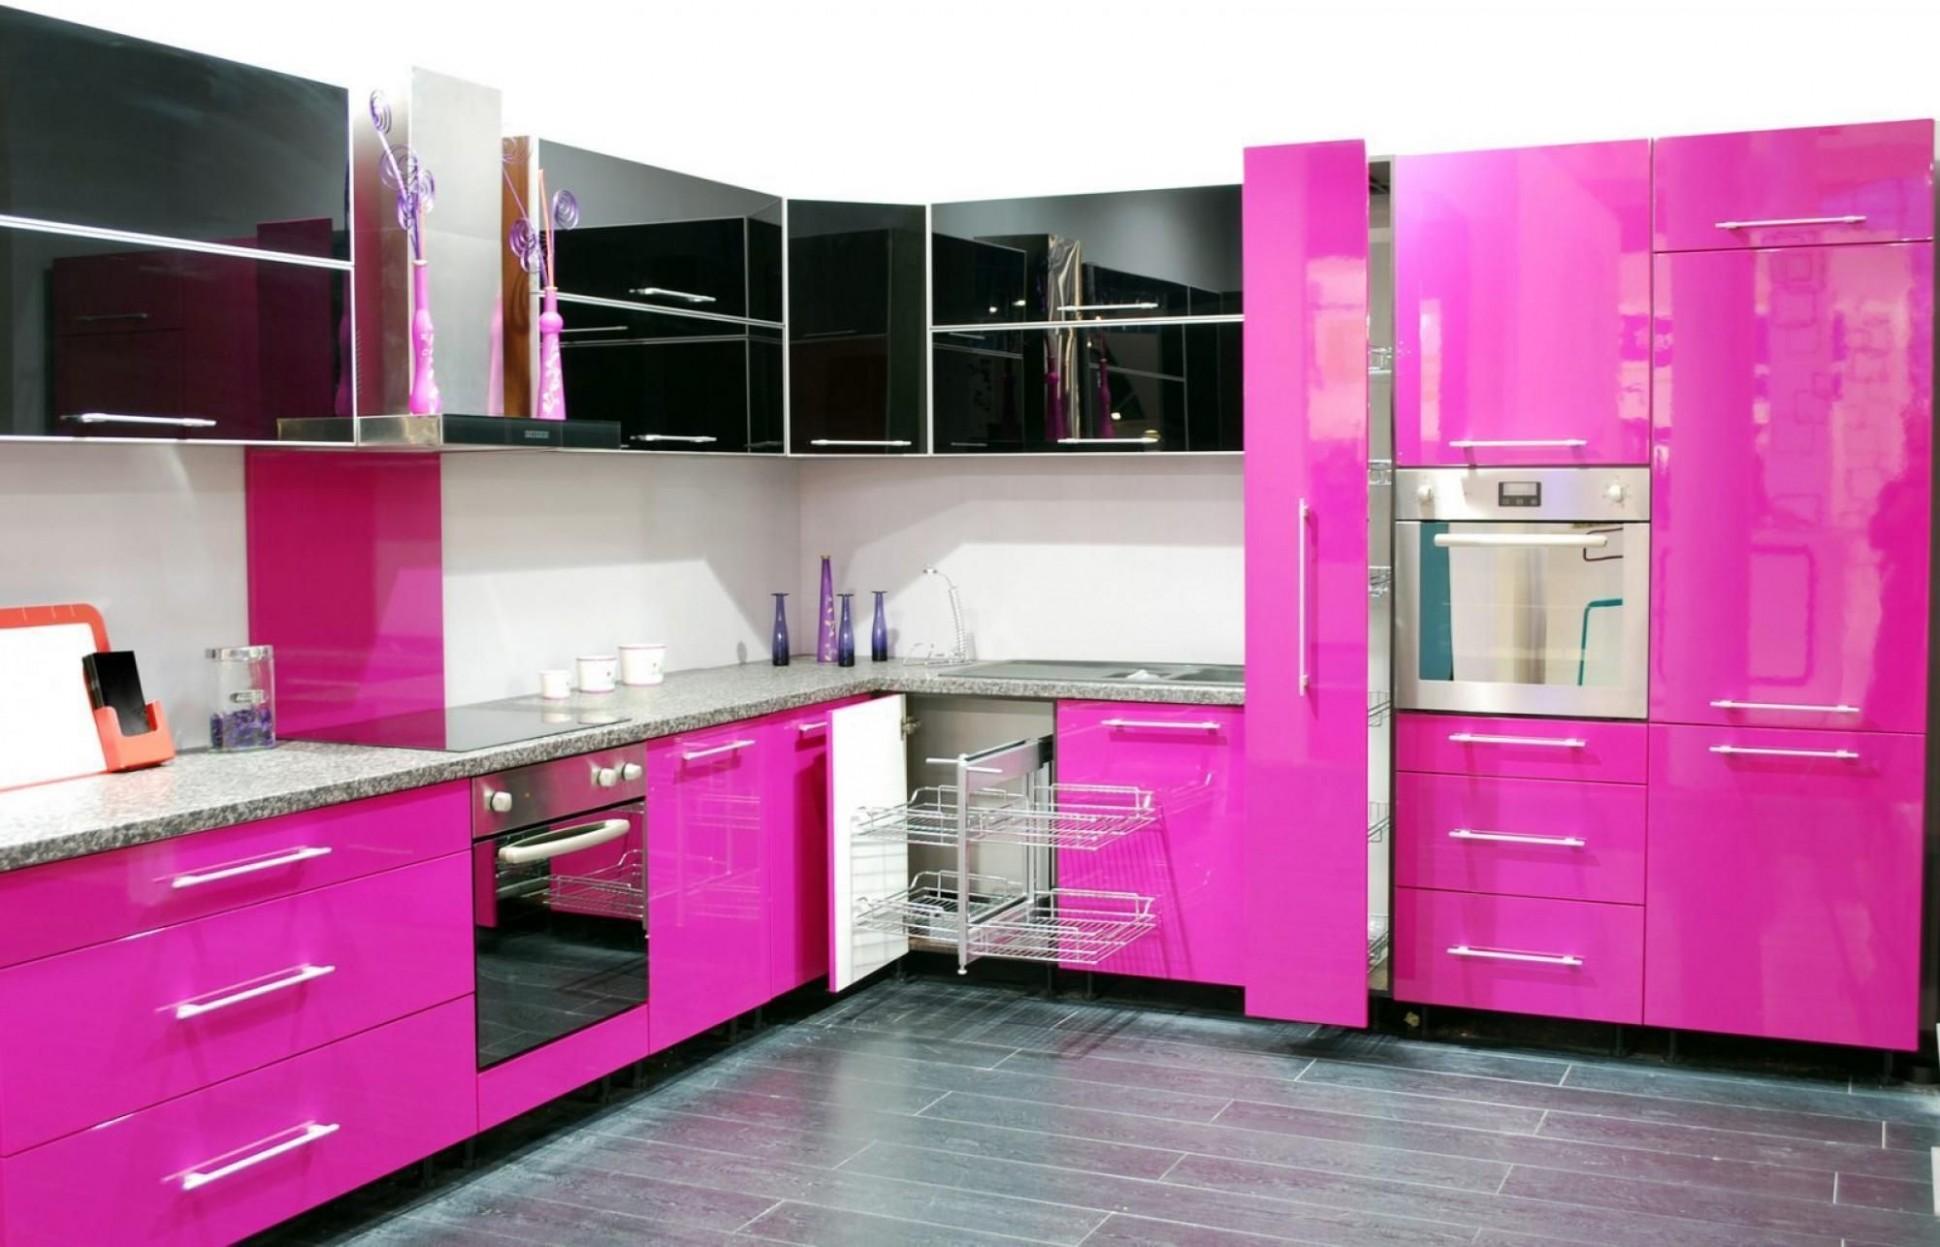 beautiful modern open kitchen design with pink gloss kitchen  - Pink And Purple Kitchen Cabinets